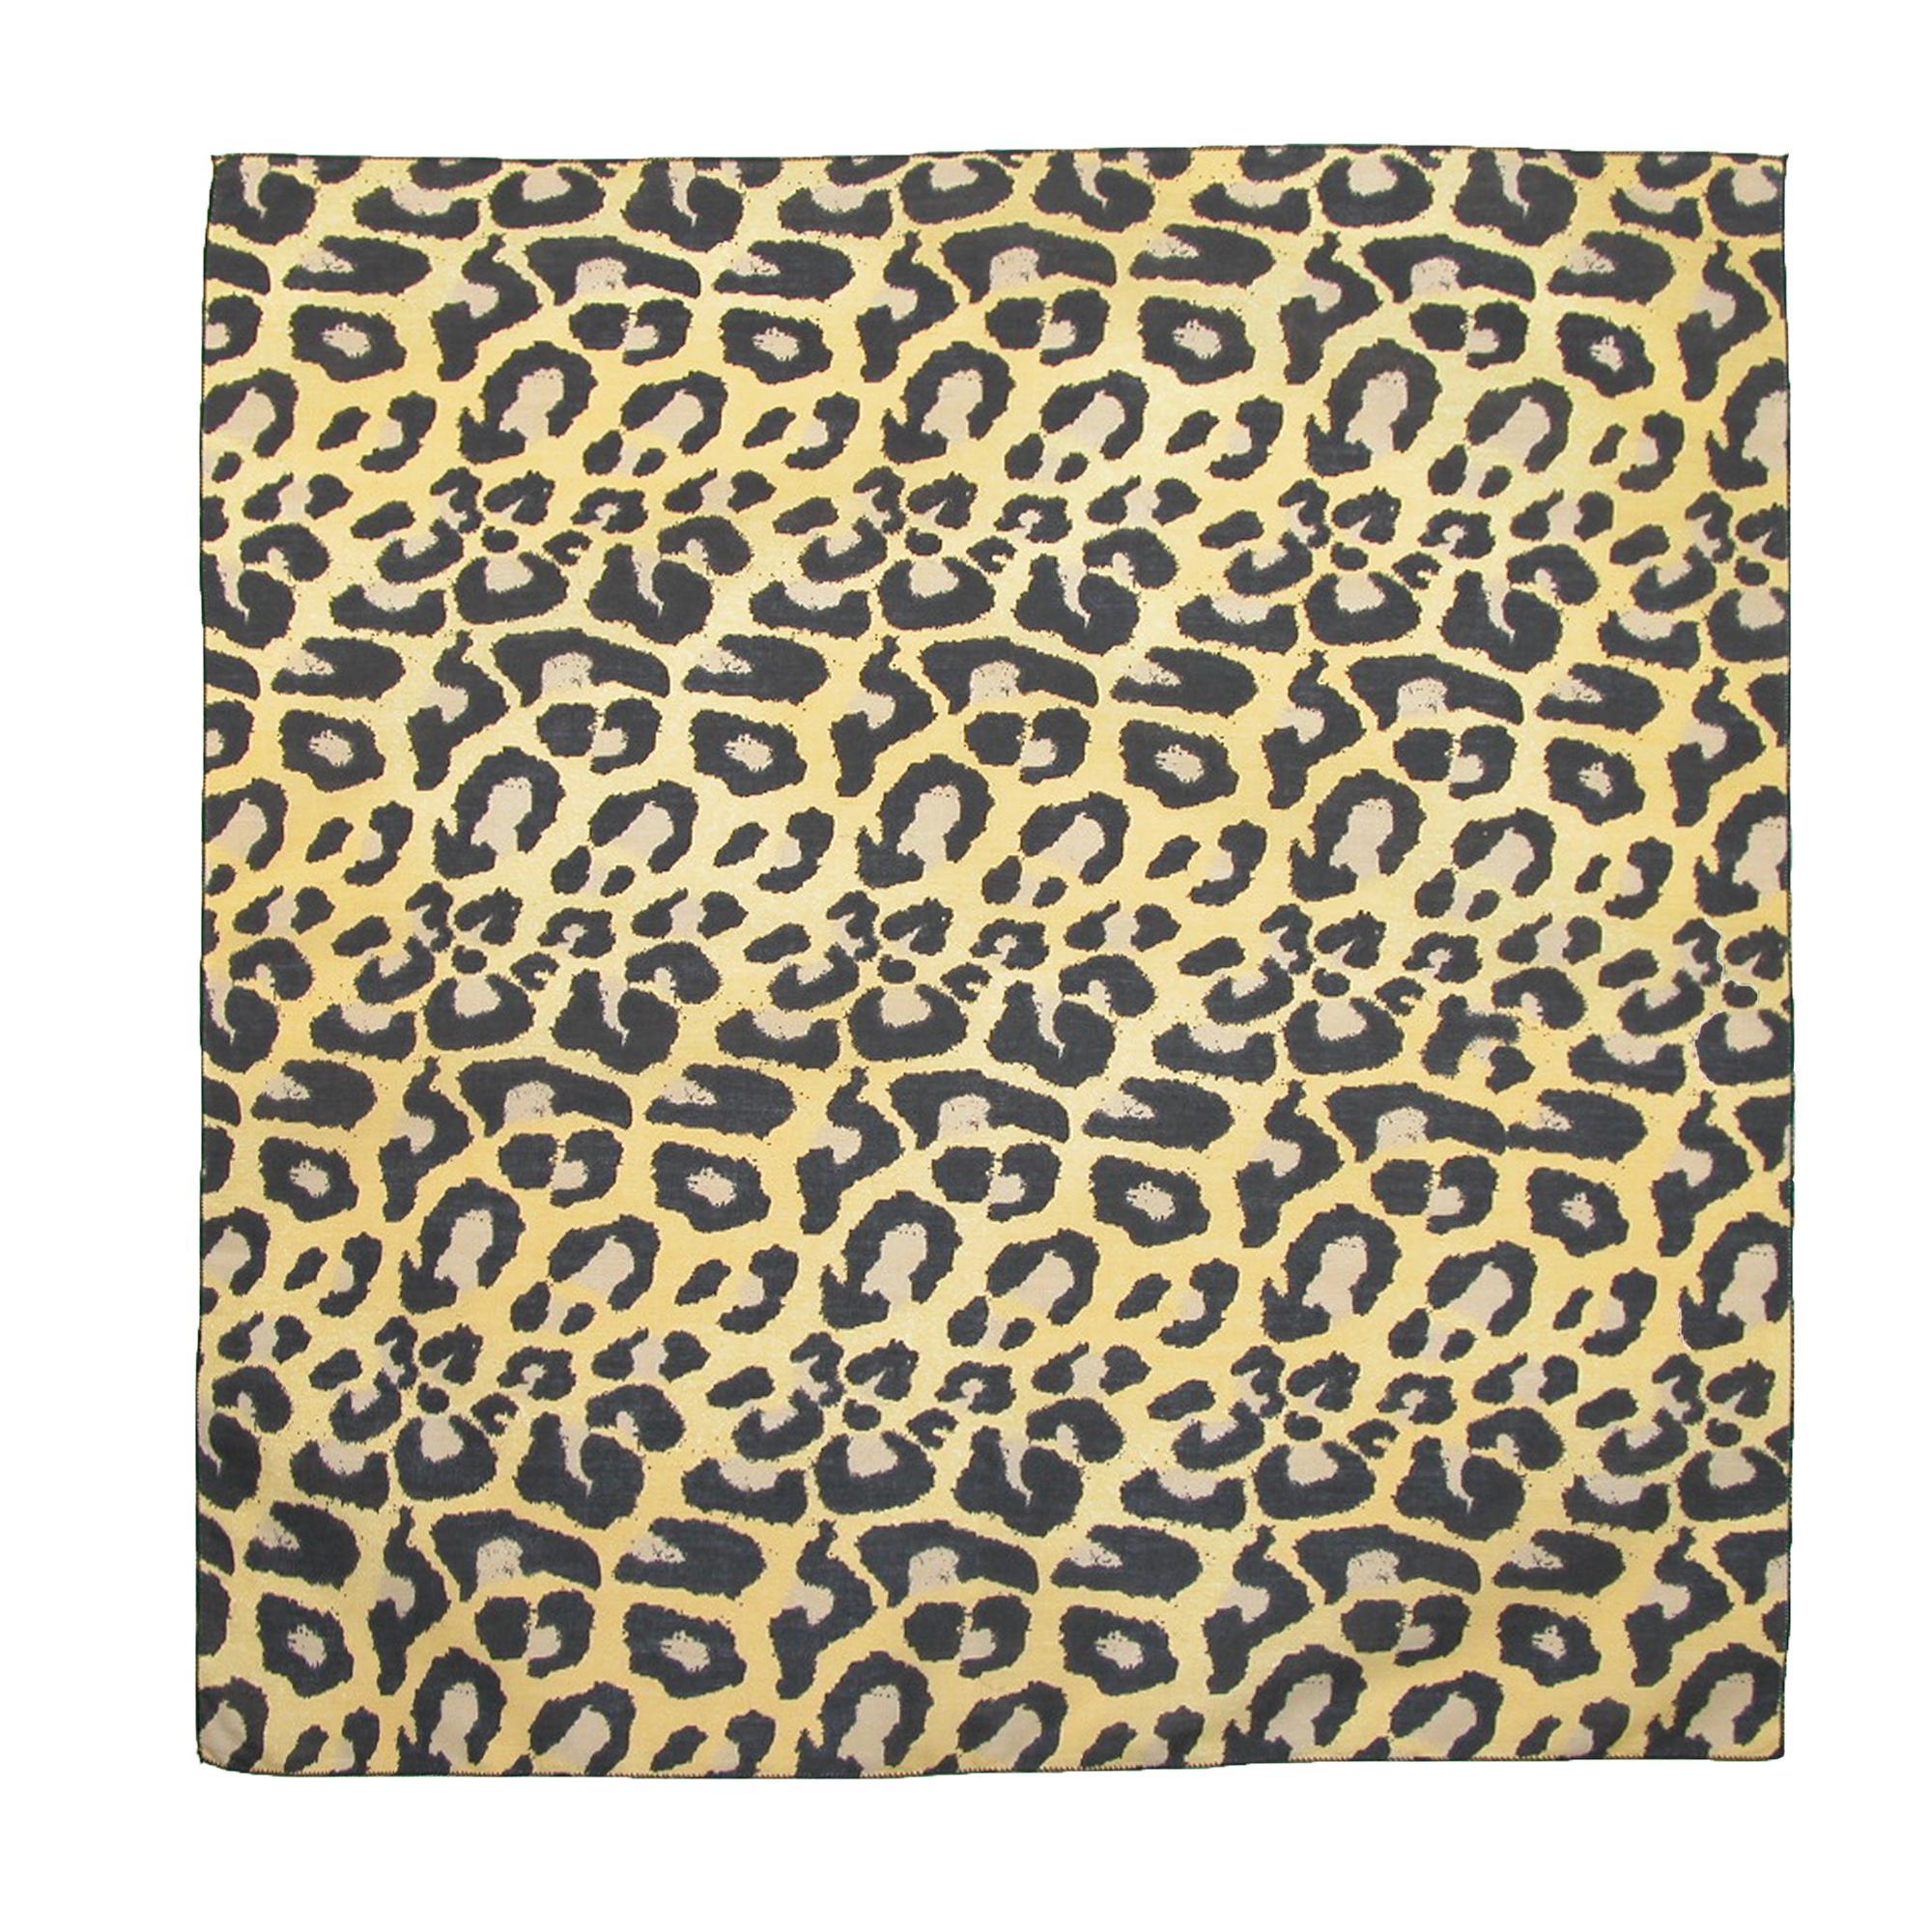 CTM_Womens_Cotton_Leopard_Print_Bandanas_